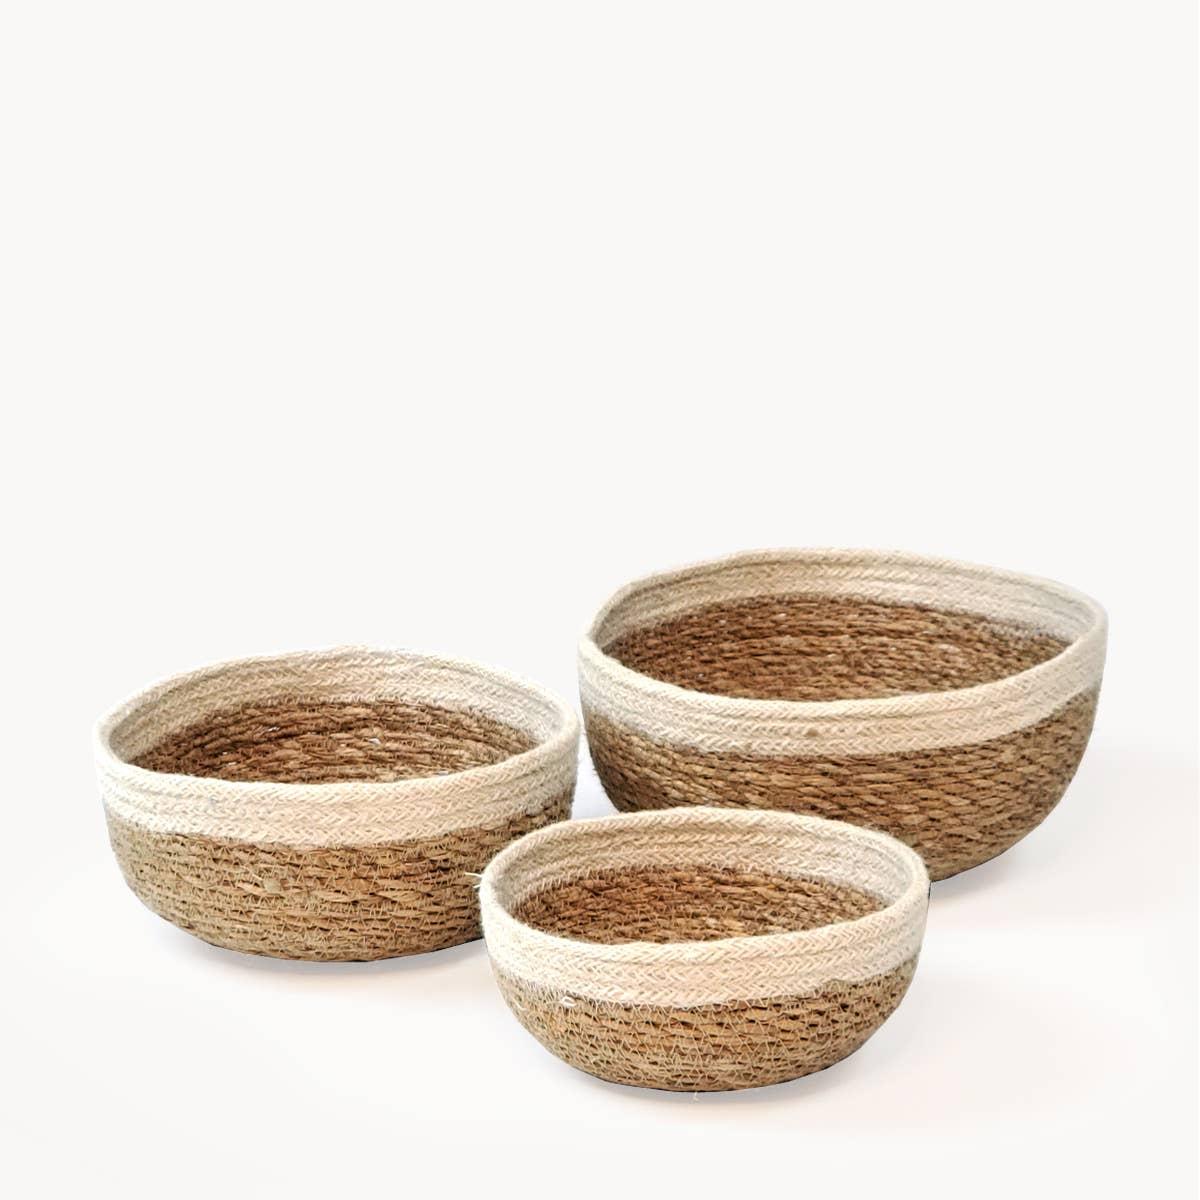 Savar Round Bowl (Set of 3) | Trada Marketplace